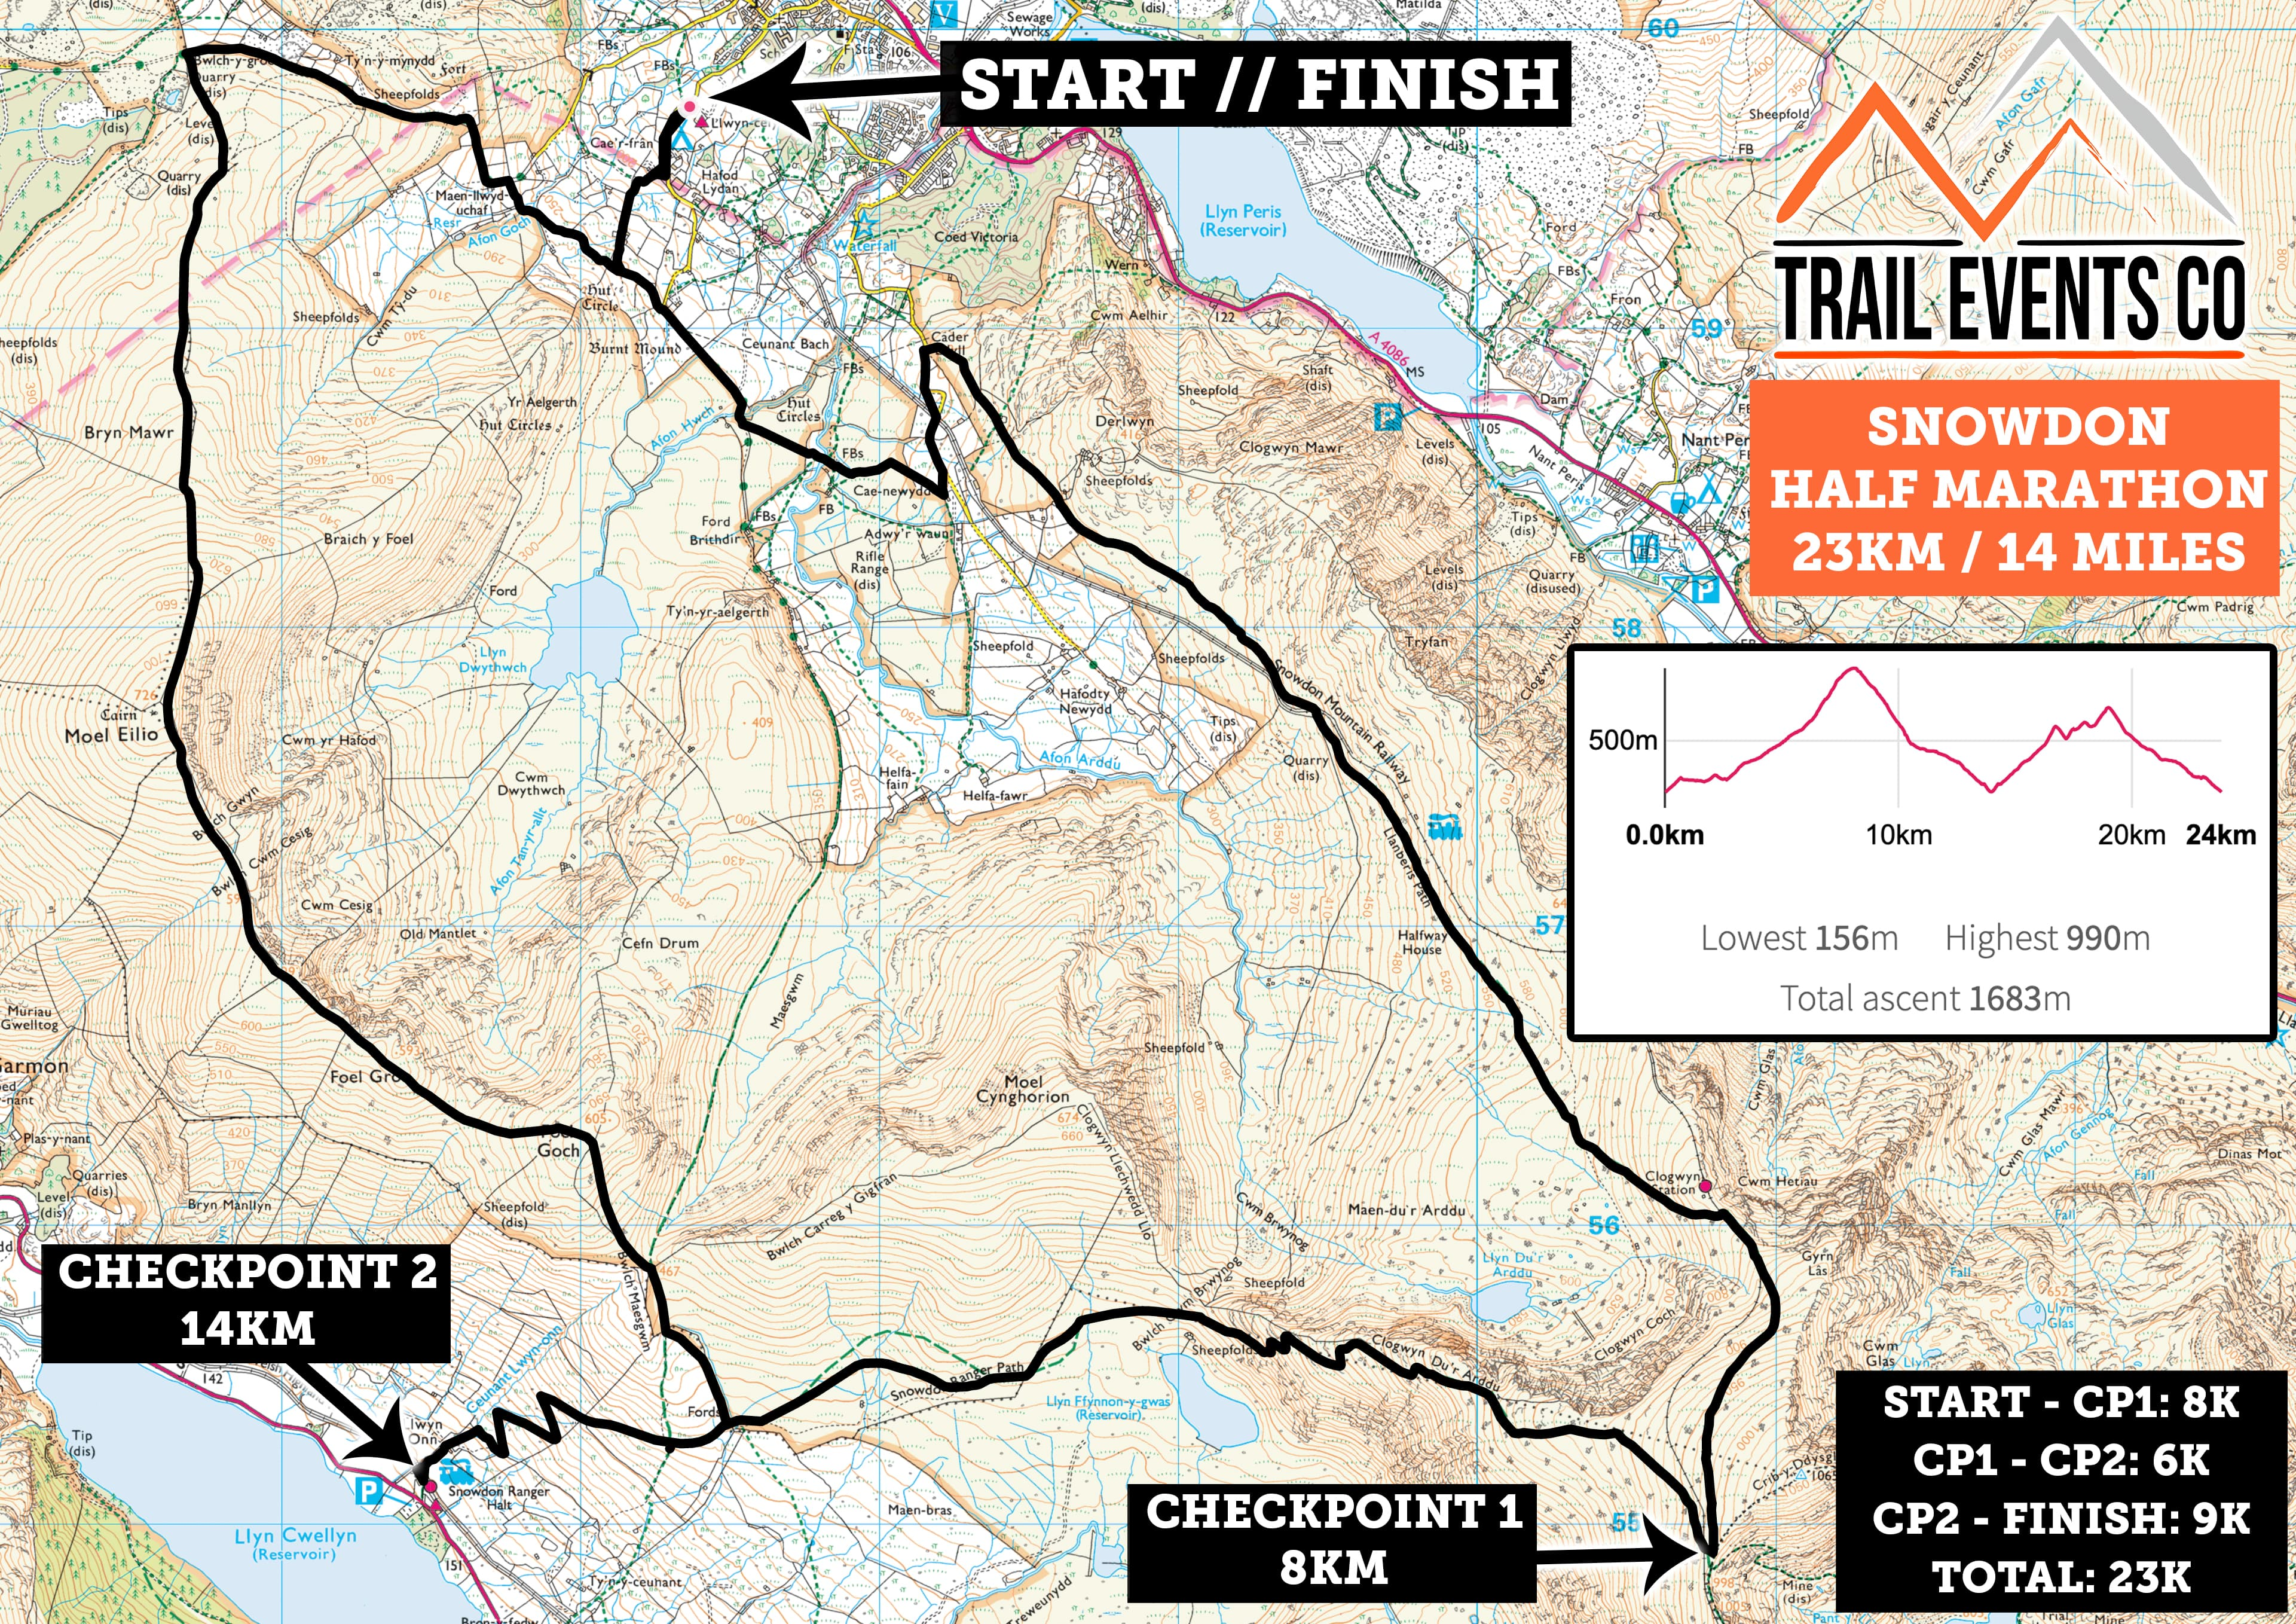 Snowdon Half Marathon Route